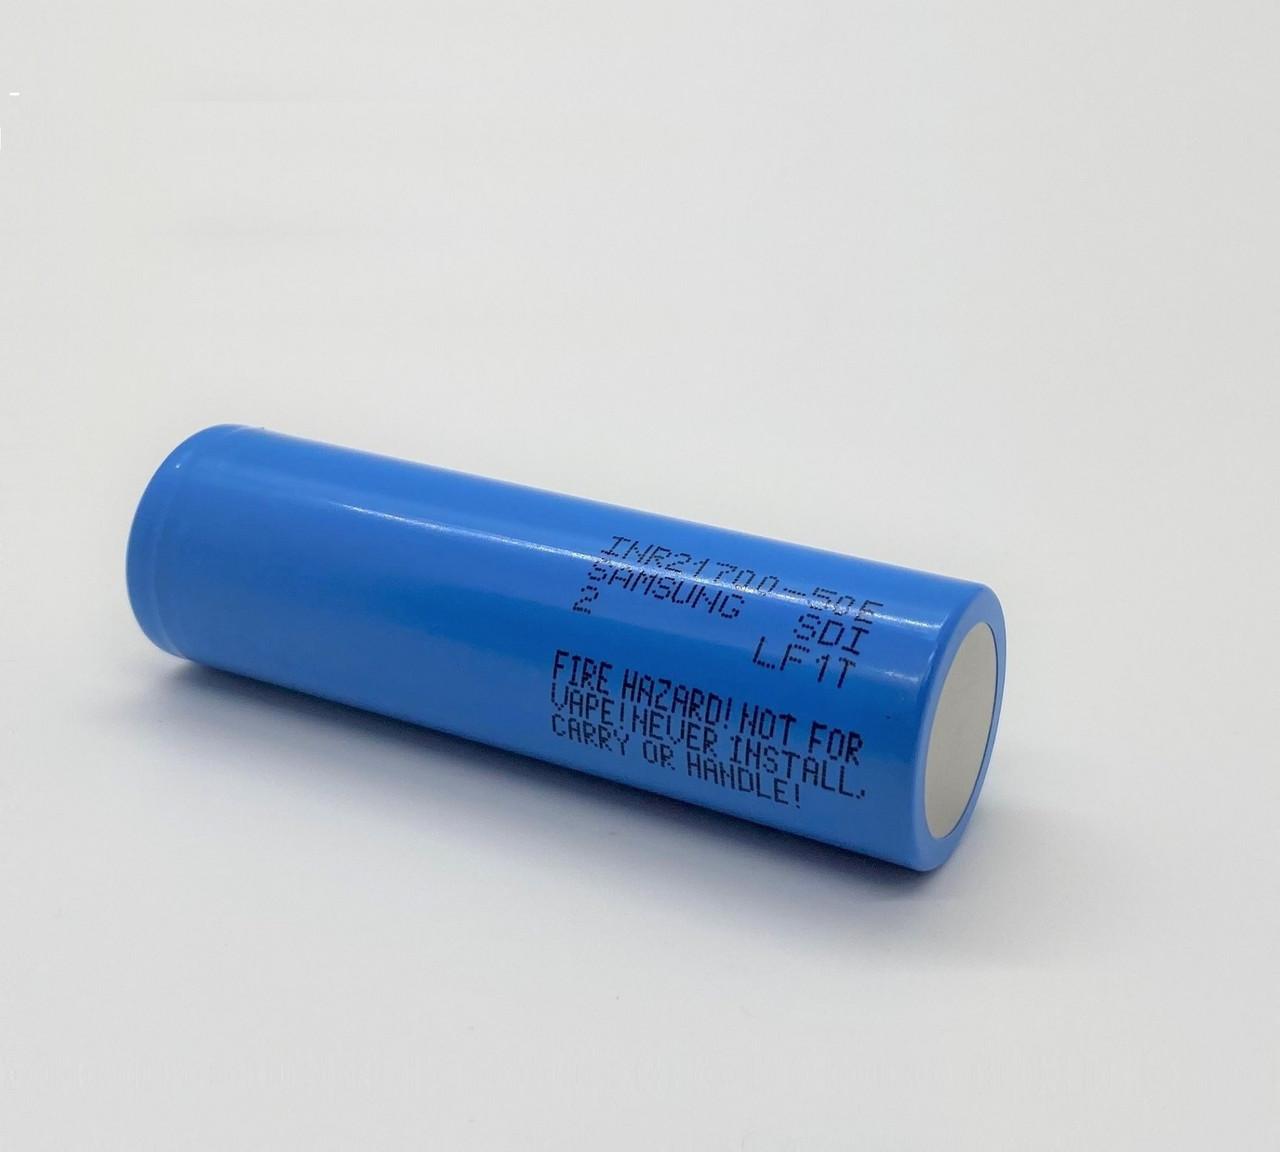 Samsung SDI INR21700-50E, 3.6 Volt, 5000mAh Lithium-Ion Rechargeable Battery